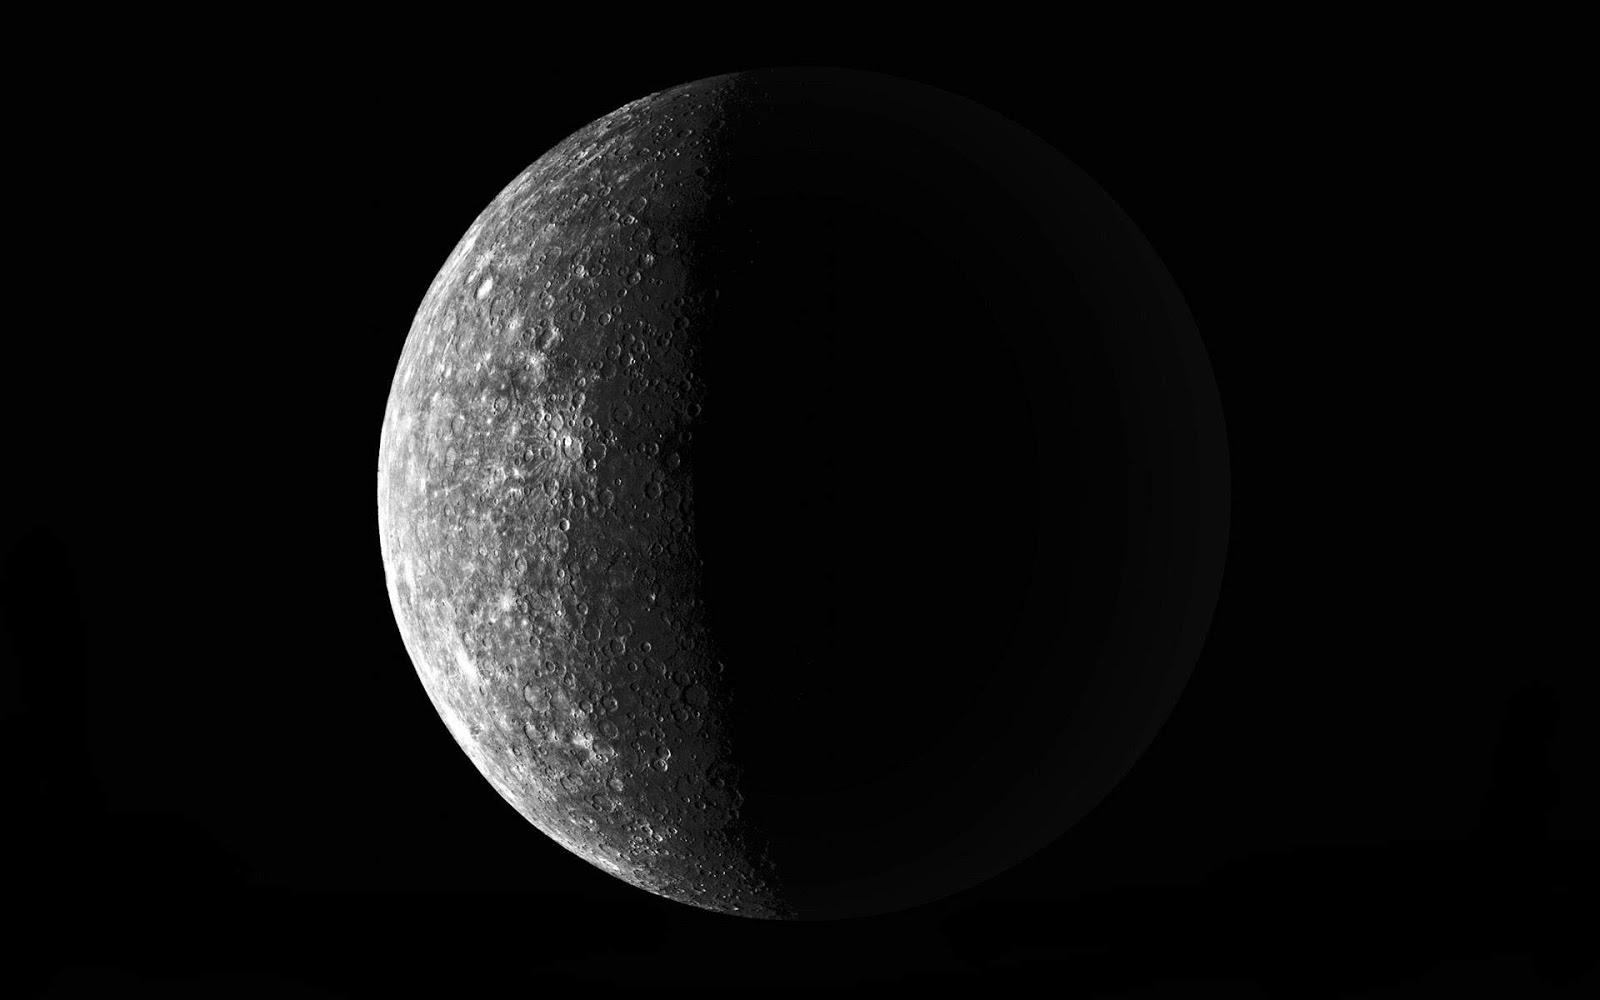 Black and White Wallpapers: Black White Moon Photo - Black White Space ...: blackandwhitewalls.blogspot.com/2012/10/black-white-moon-photo...